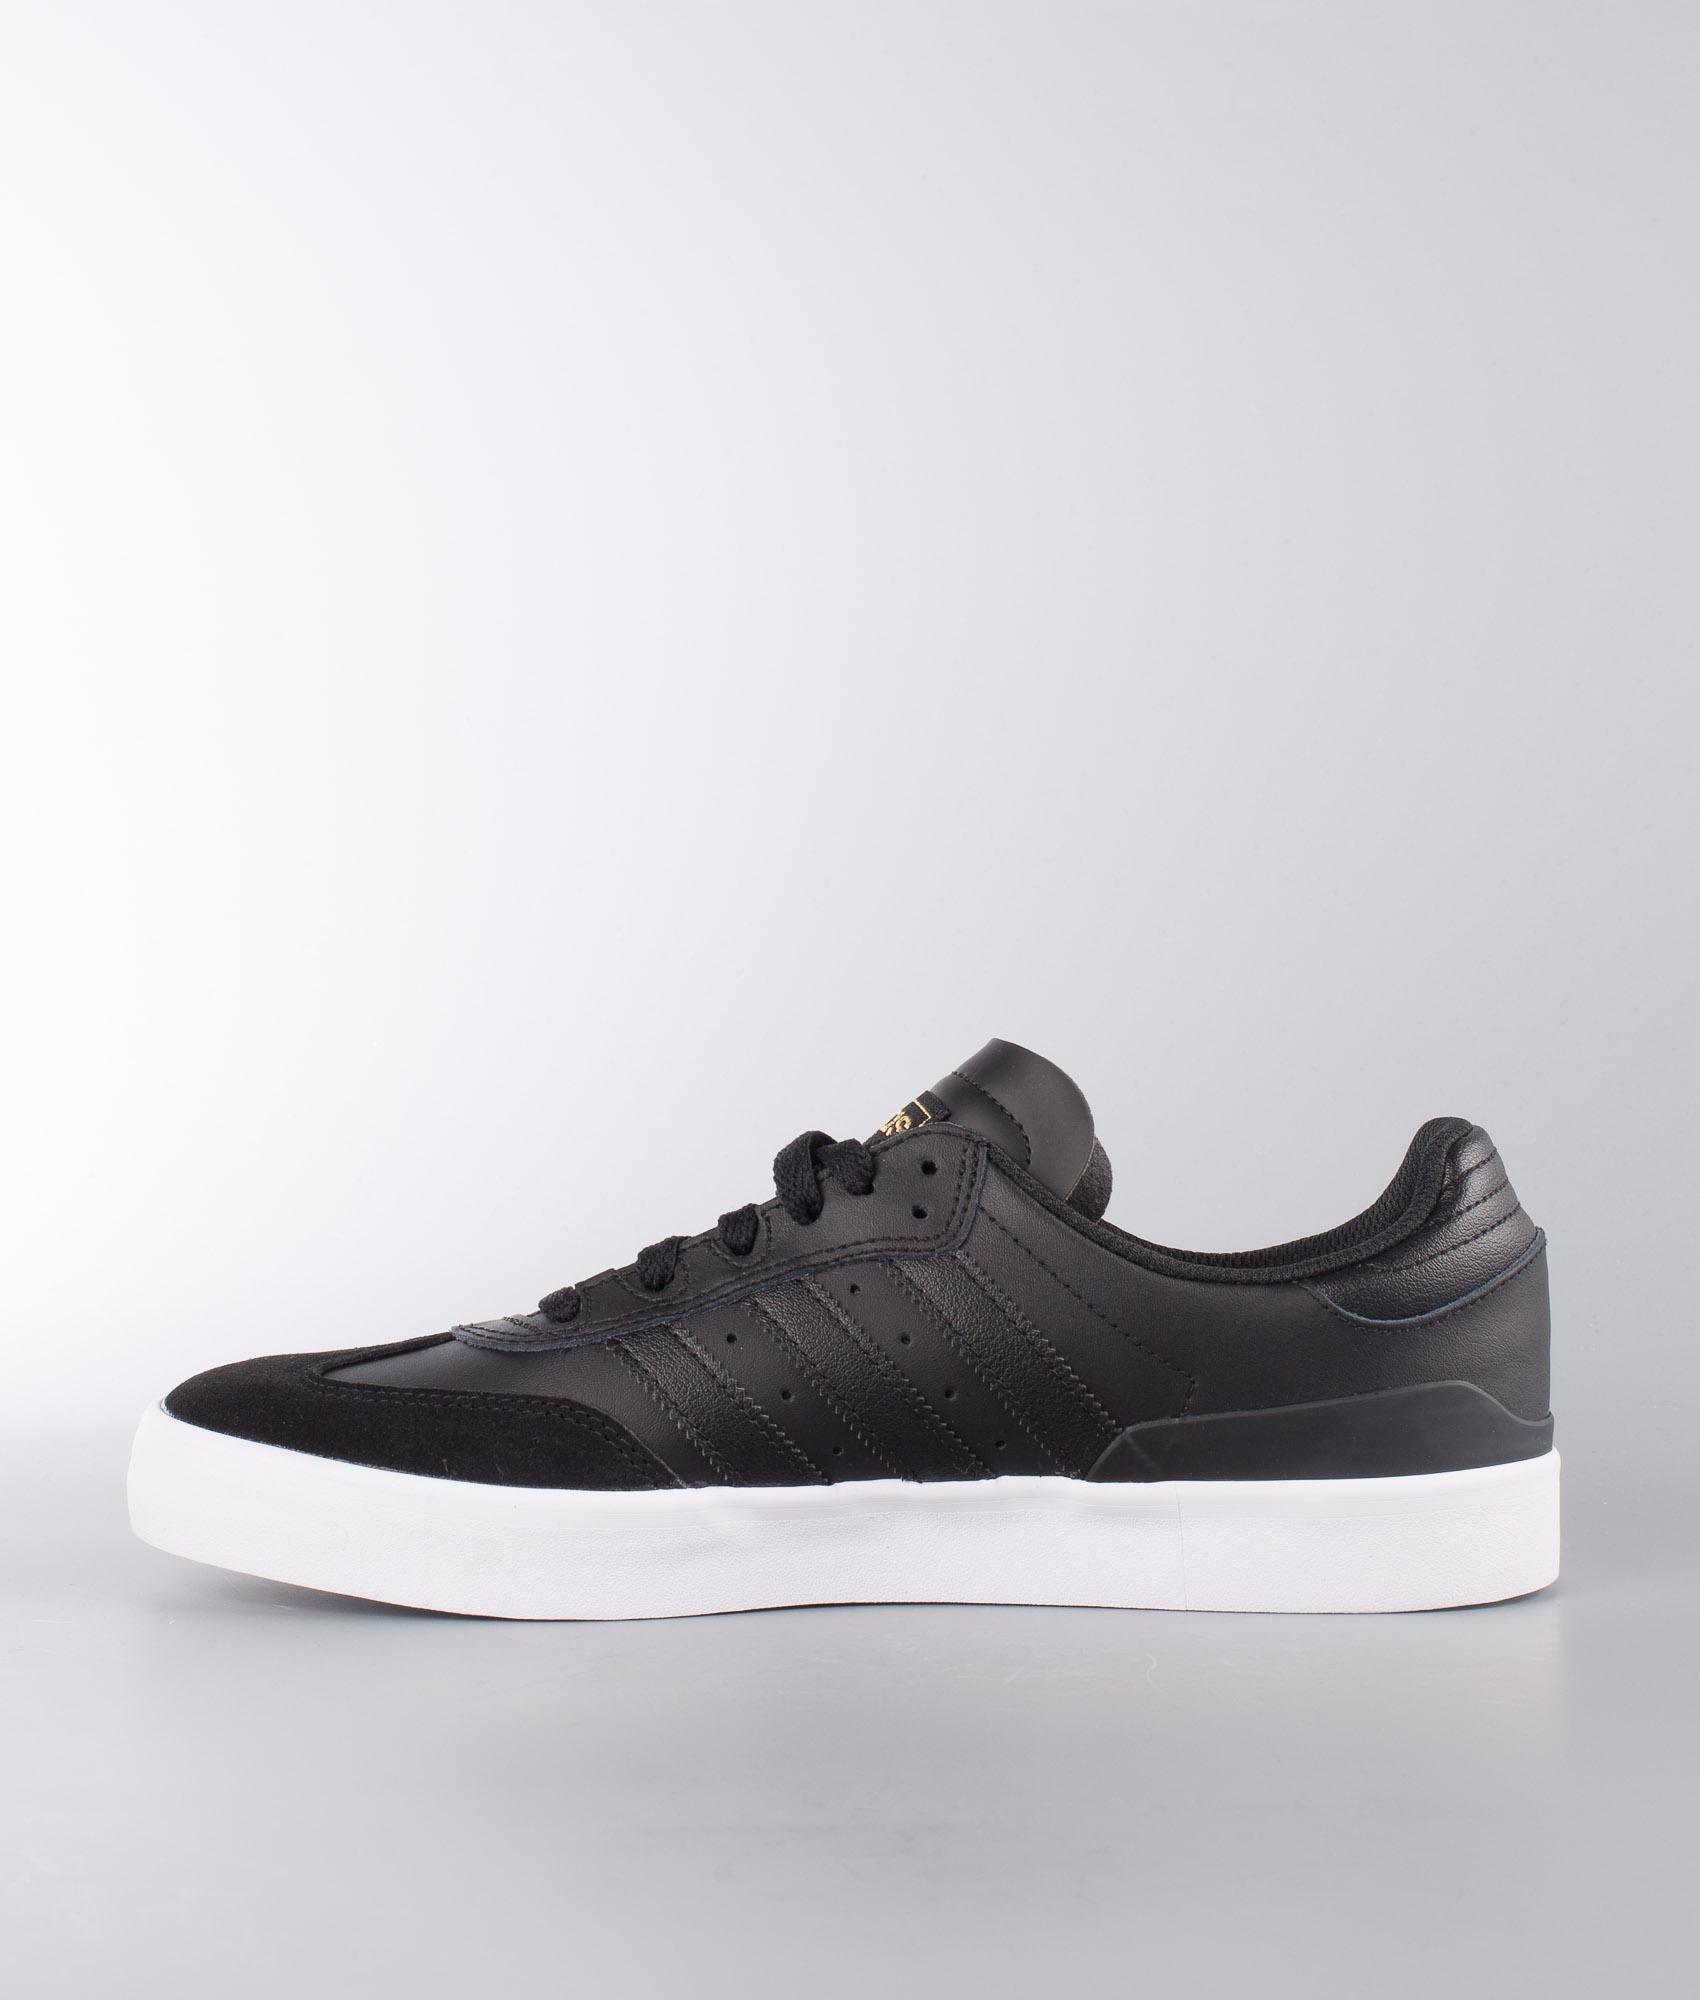 Vulc Skate Chaussures 1571c Ae481 Tout Busenitz Norway Adidas Noir l1JcFTK